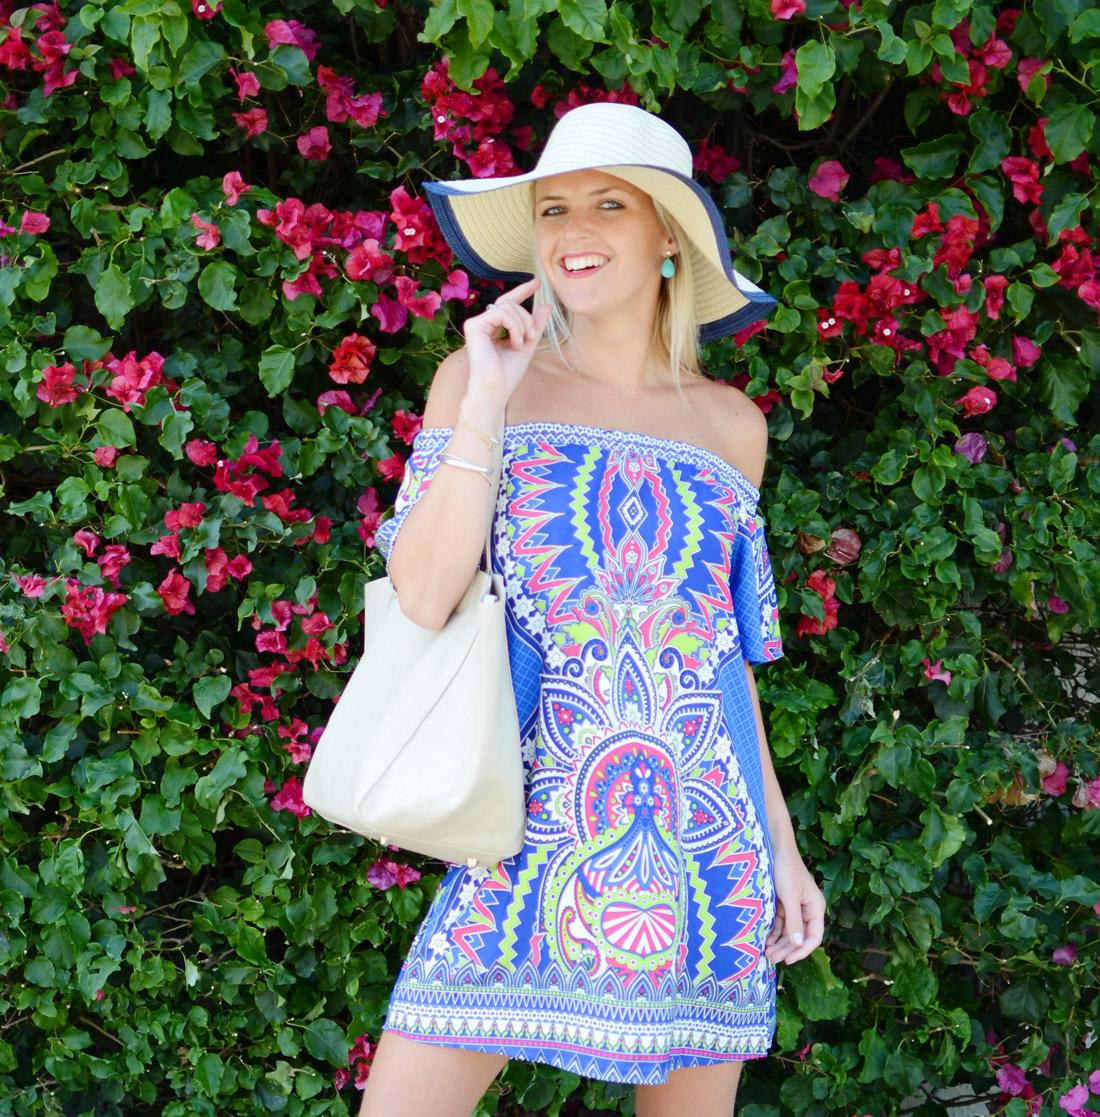 bag-at-you-fashion-blog-shopper-bag-toss-designs